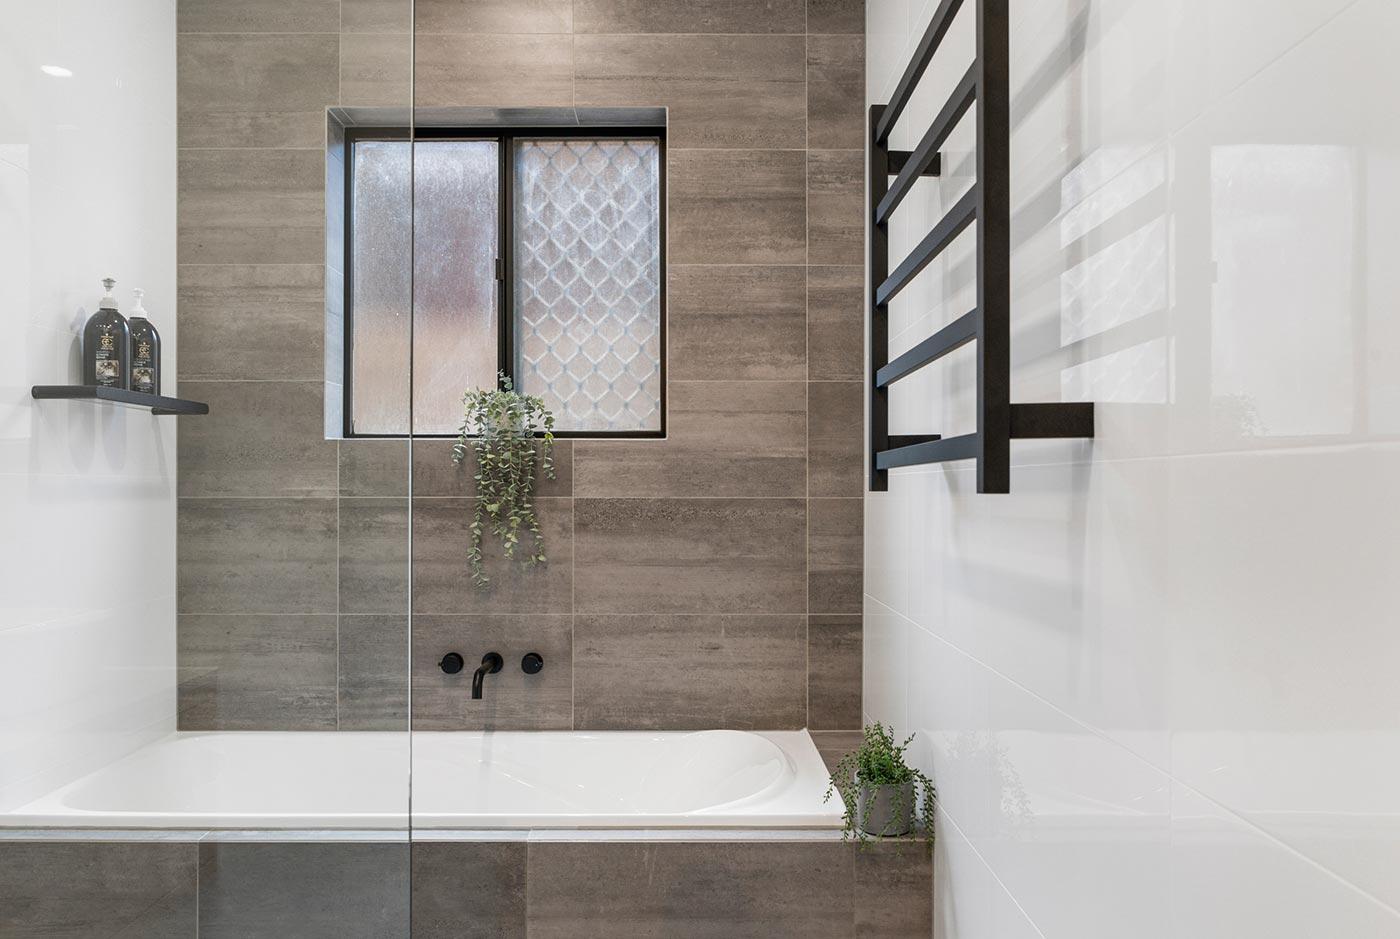 home bathroom renovations image